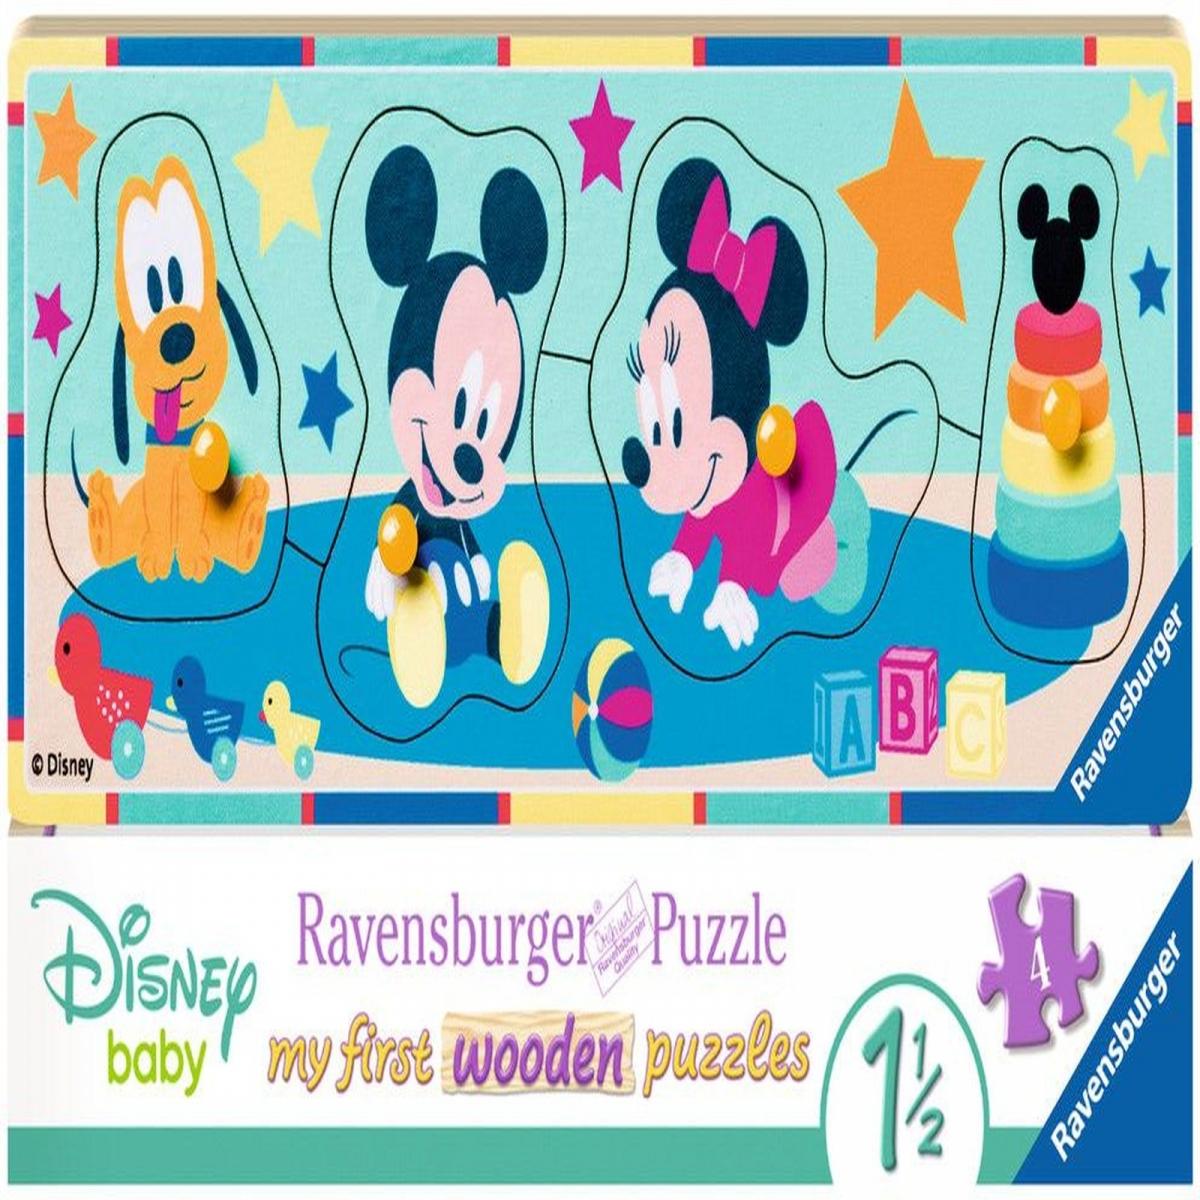 Mukk Spielwaren Münster Ravensburger Puzzle Disney Klassiker